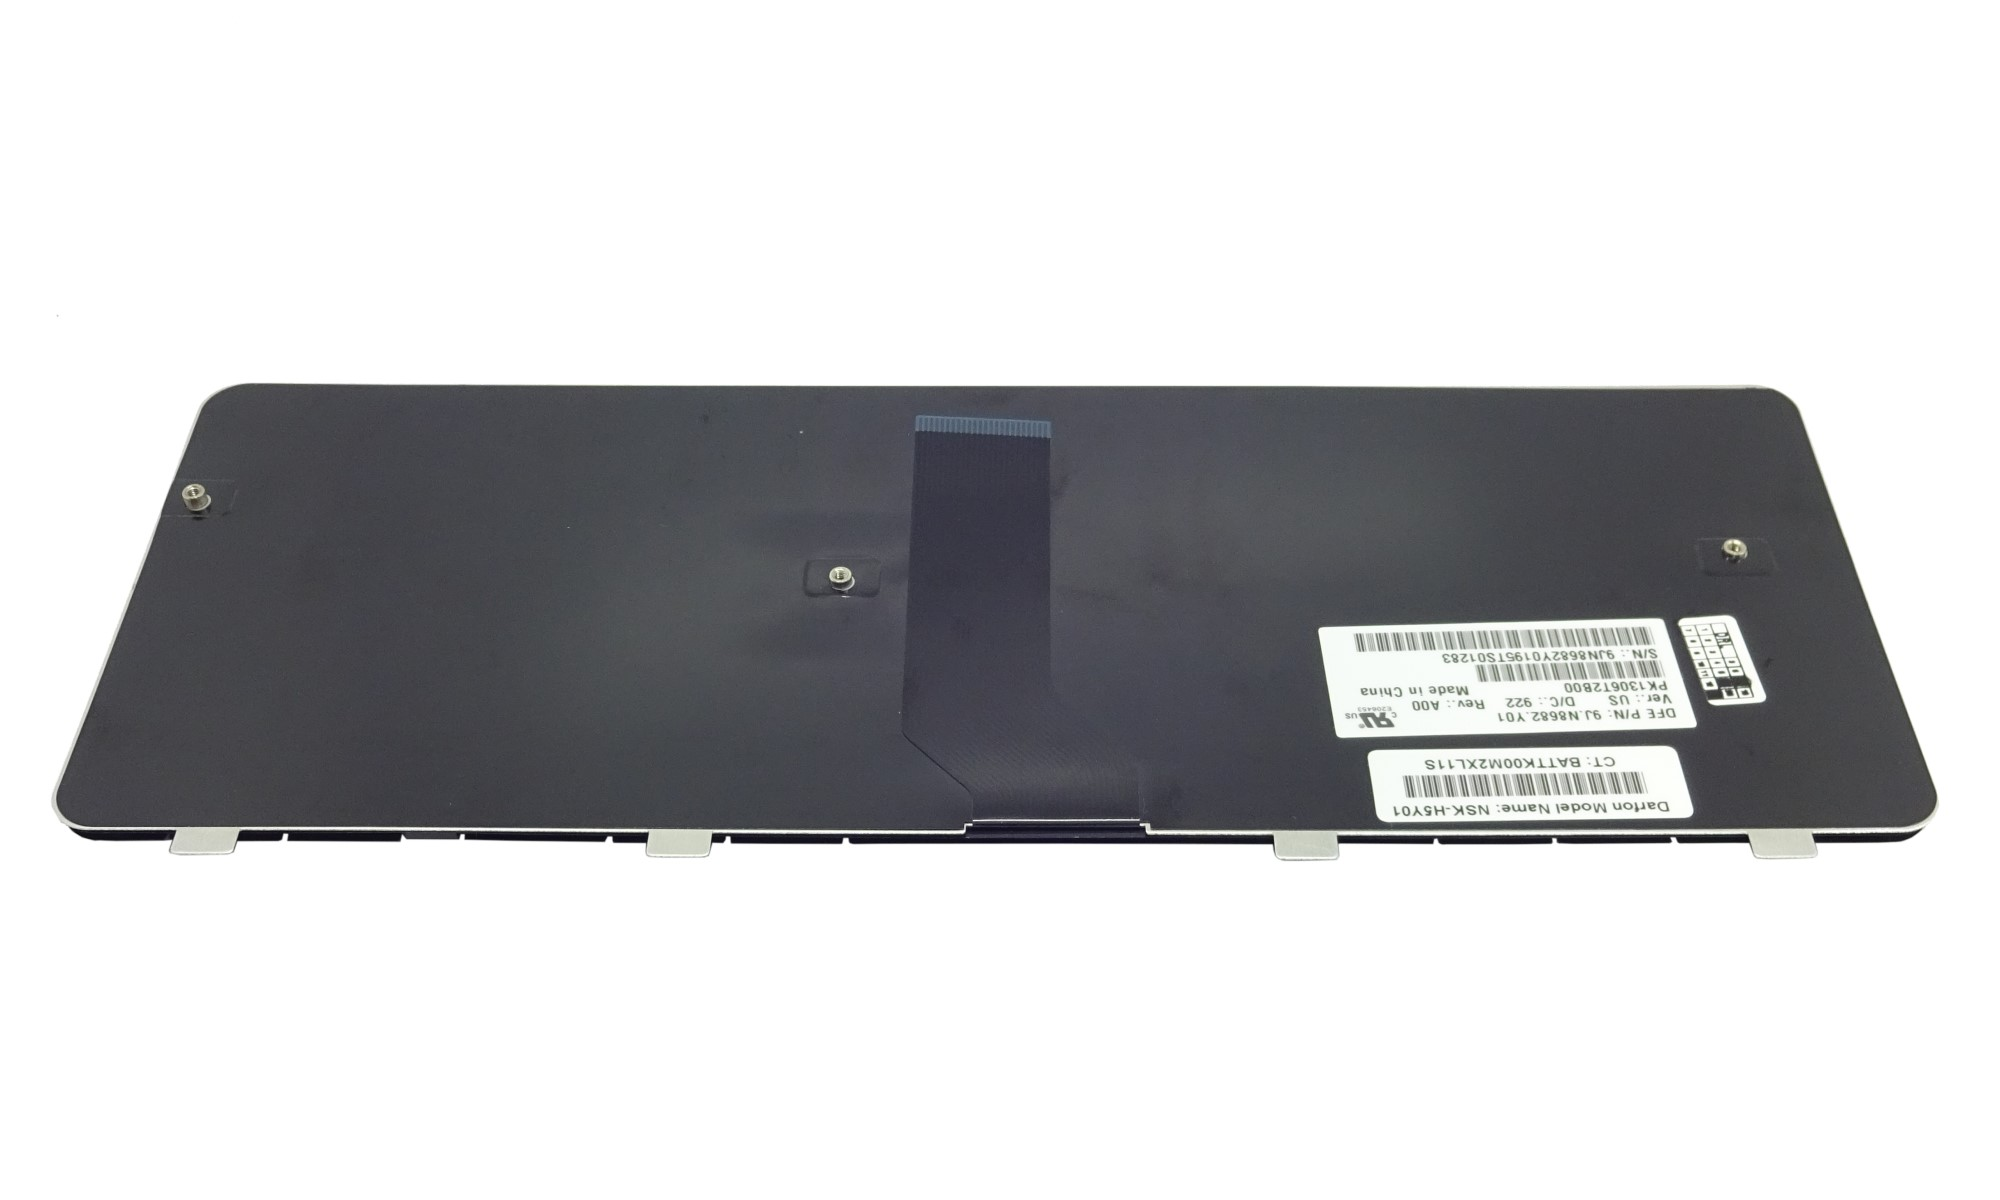 Tastatura compatibila HP Pavilion DV4-1000, negru lucios